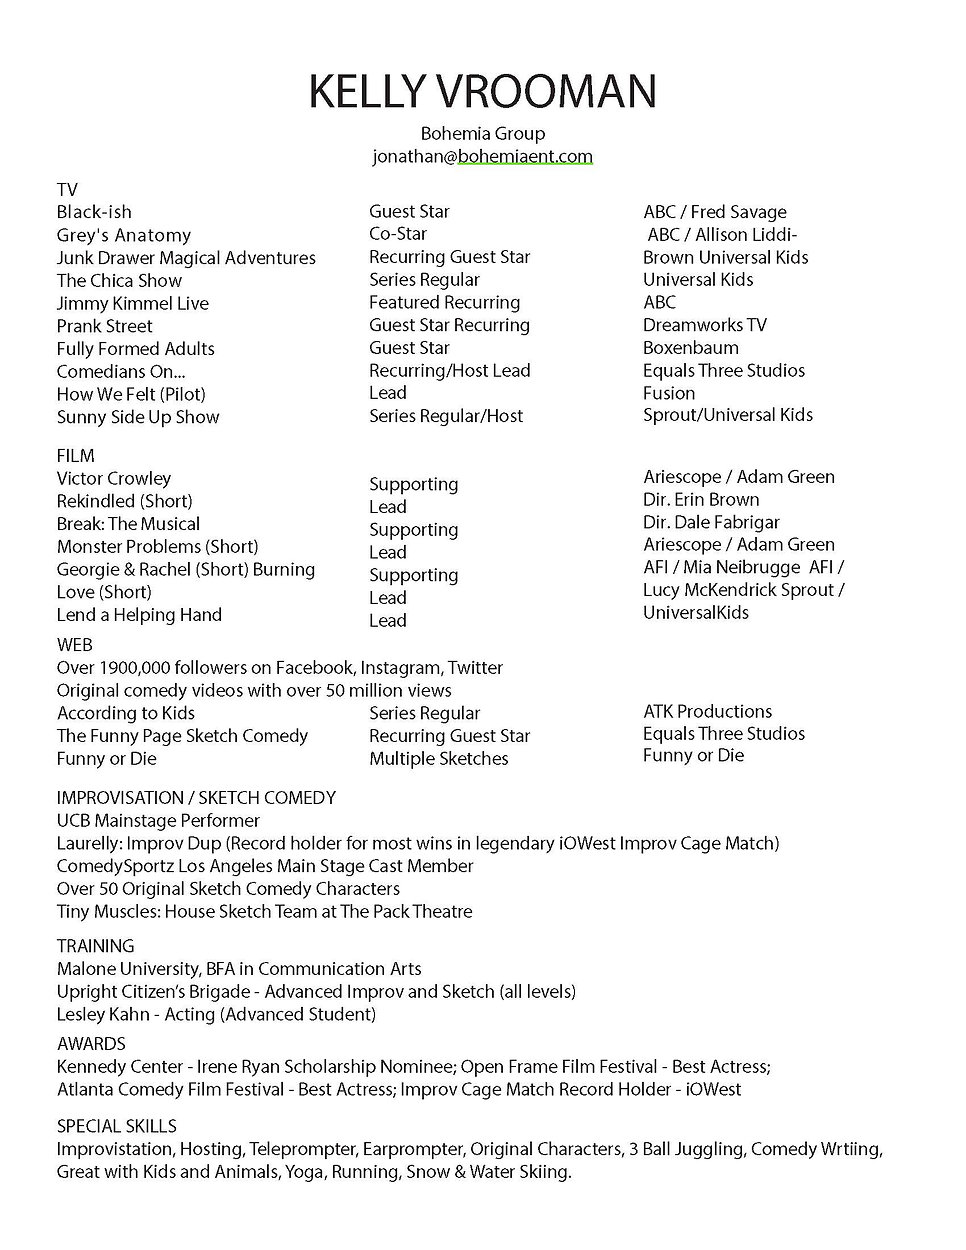 Acting Resume Dec 2020.jpg